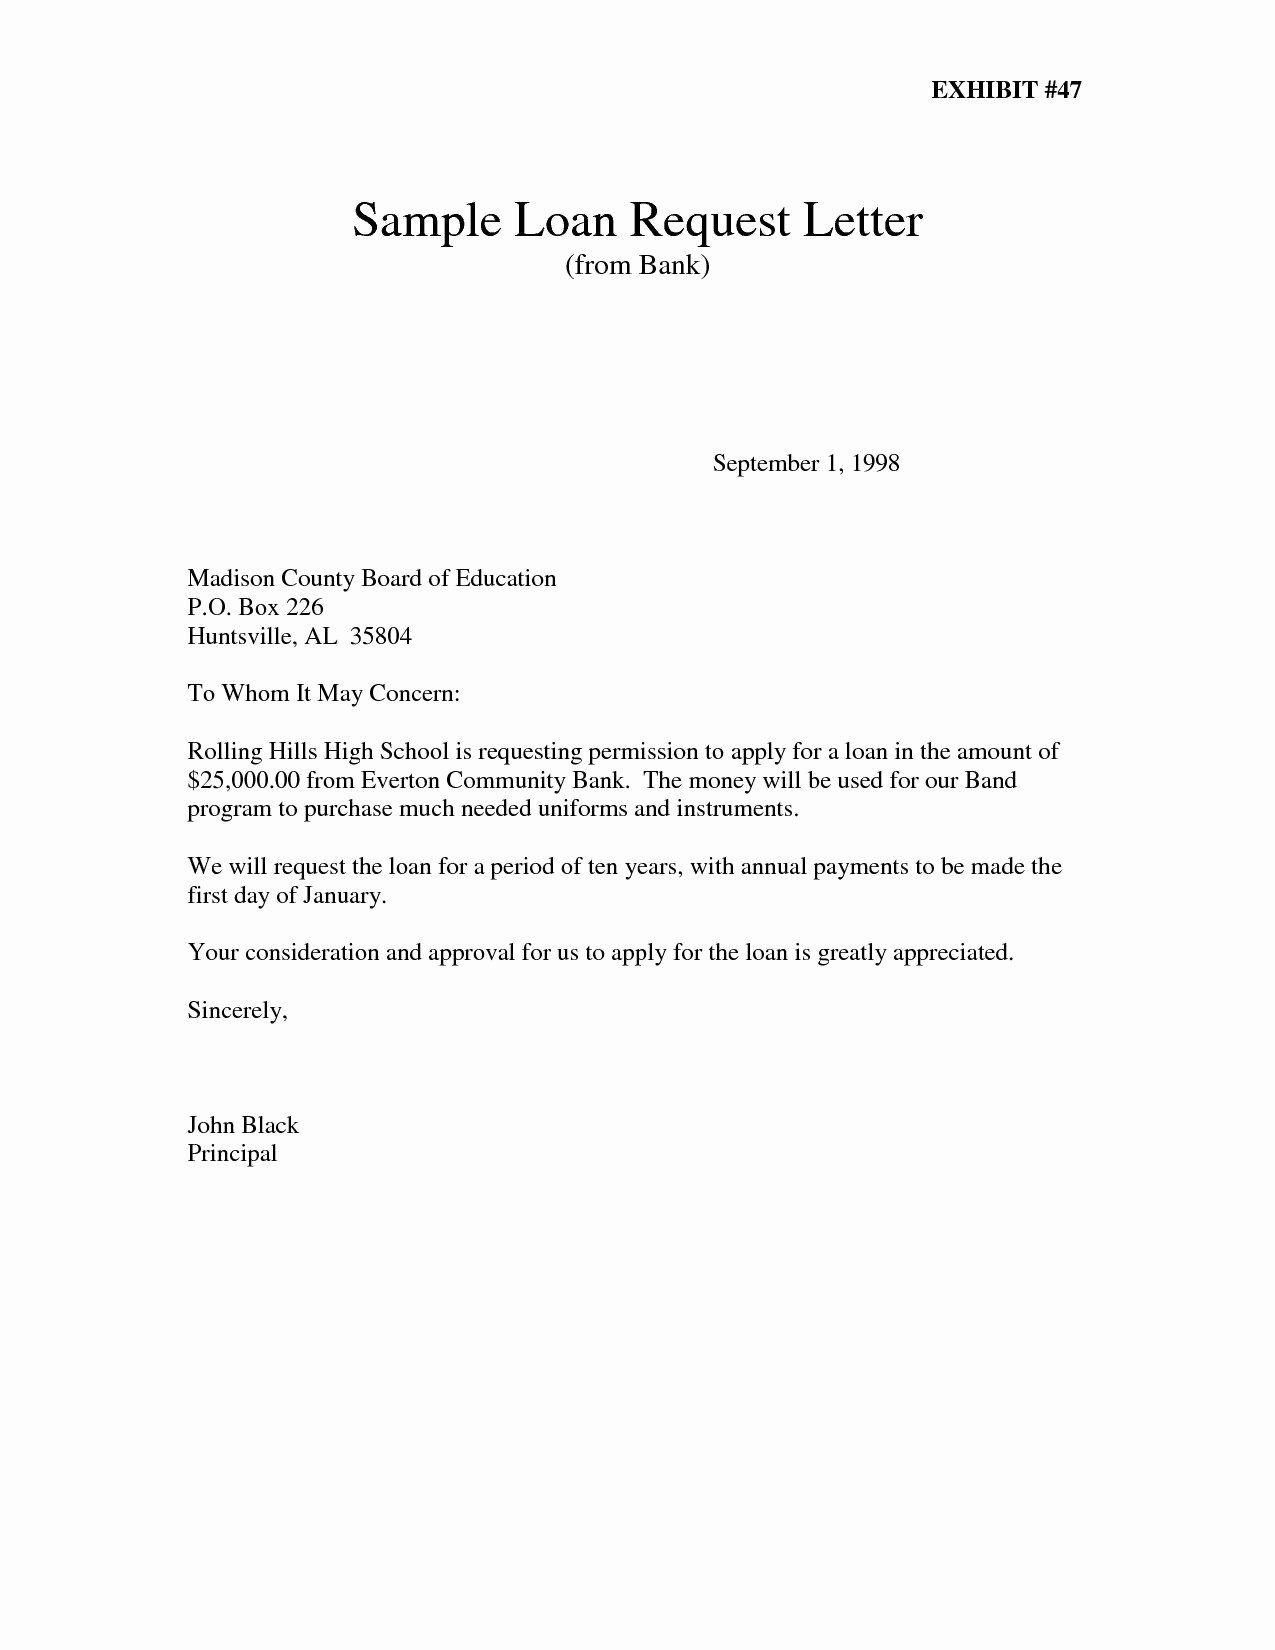 Personal Loan Proposal Template Unique Application Letter